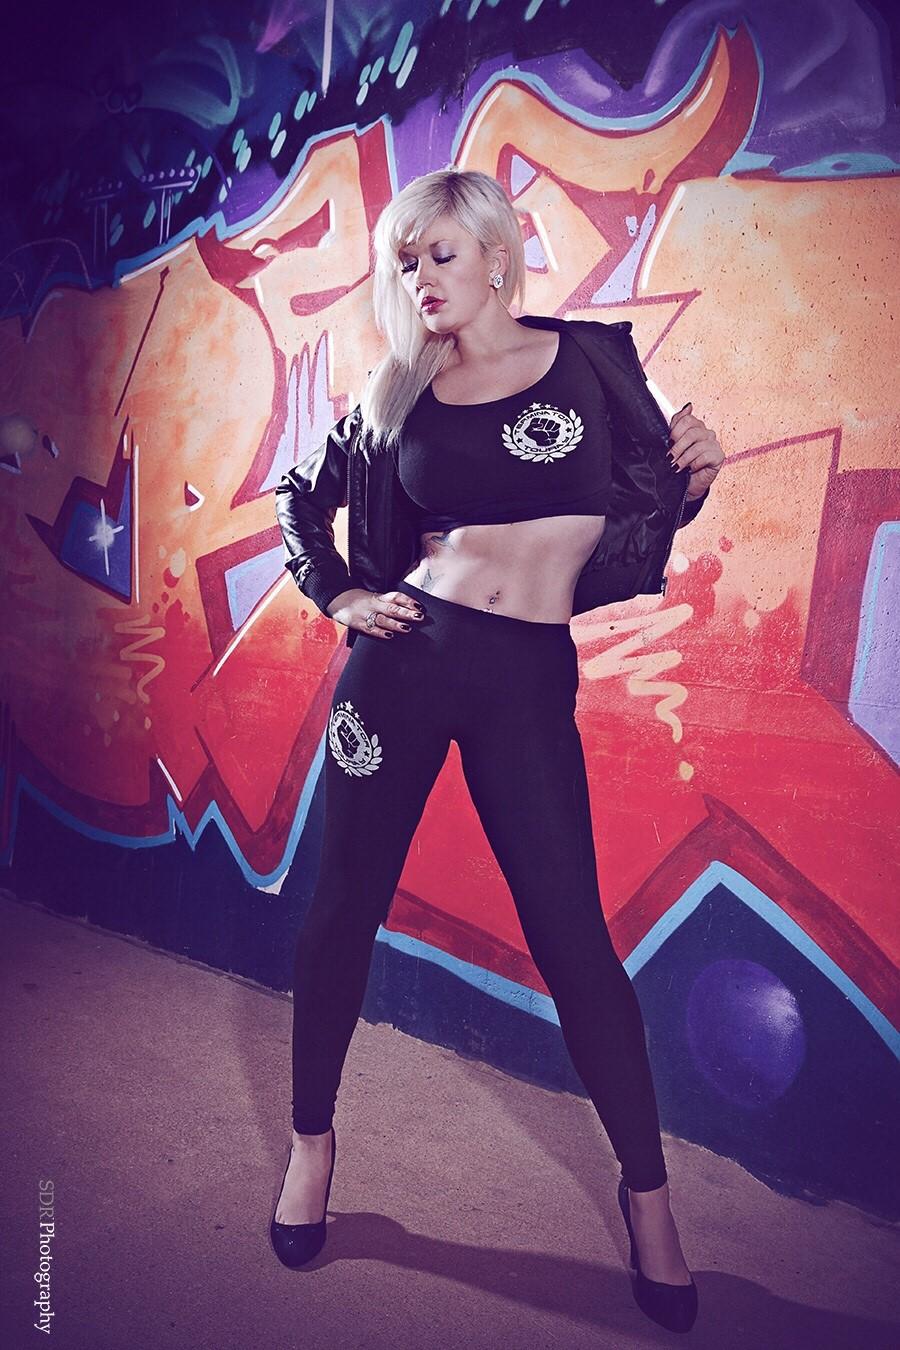 boxing promo shoot / Model Lelly D / Uploaded 18th January 2015 @ 08:06 AM